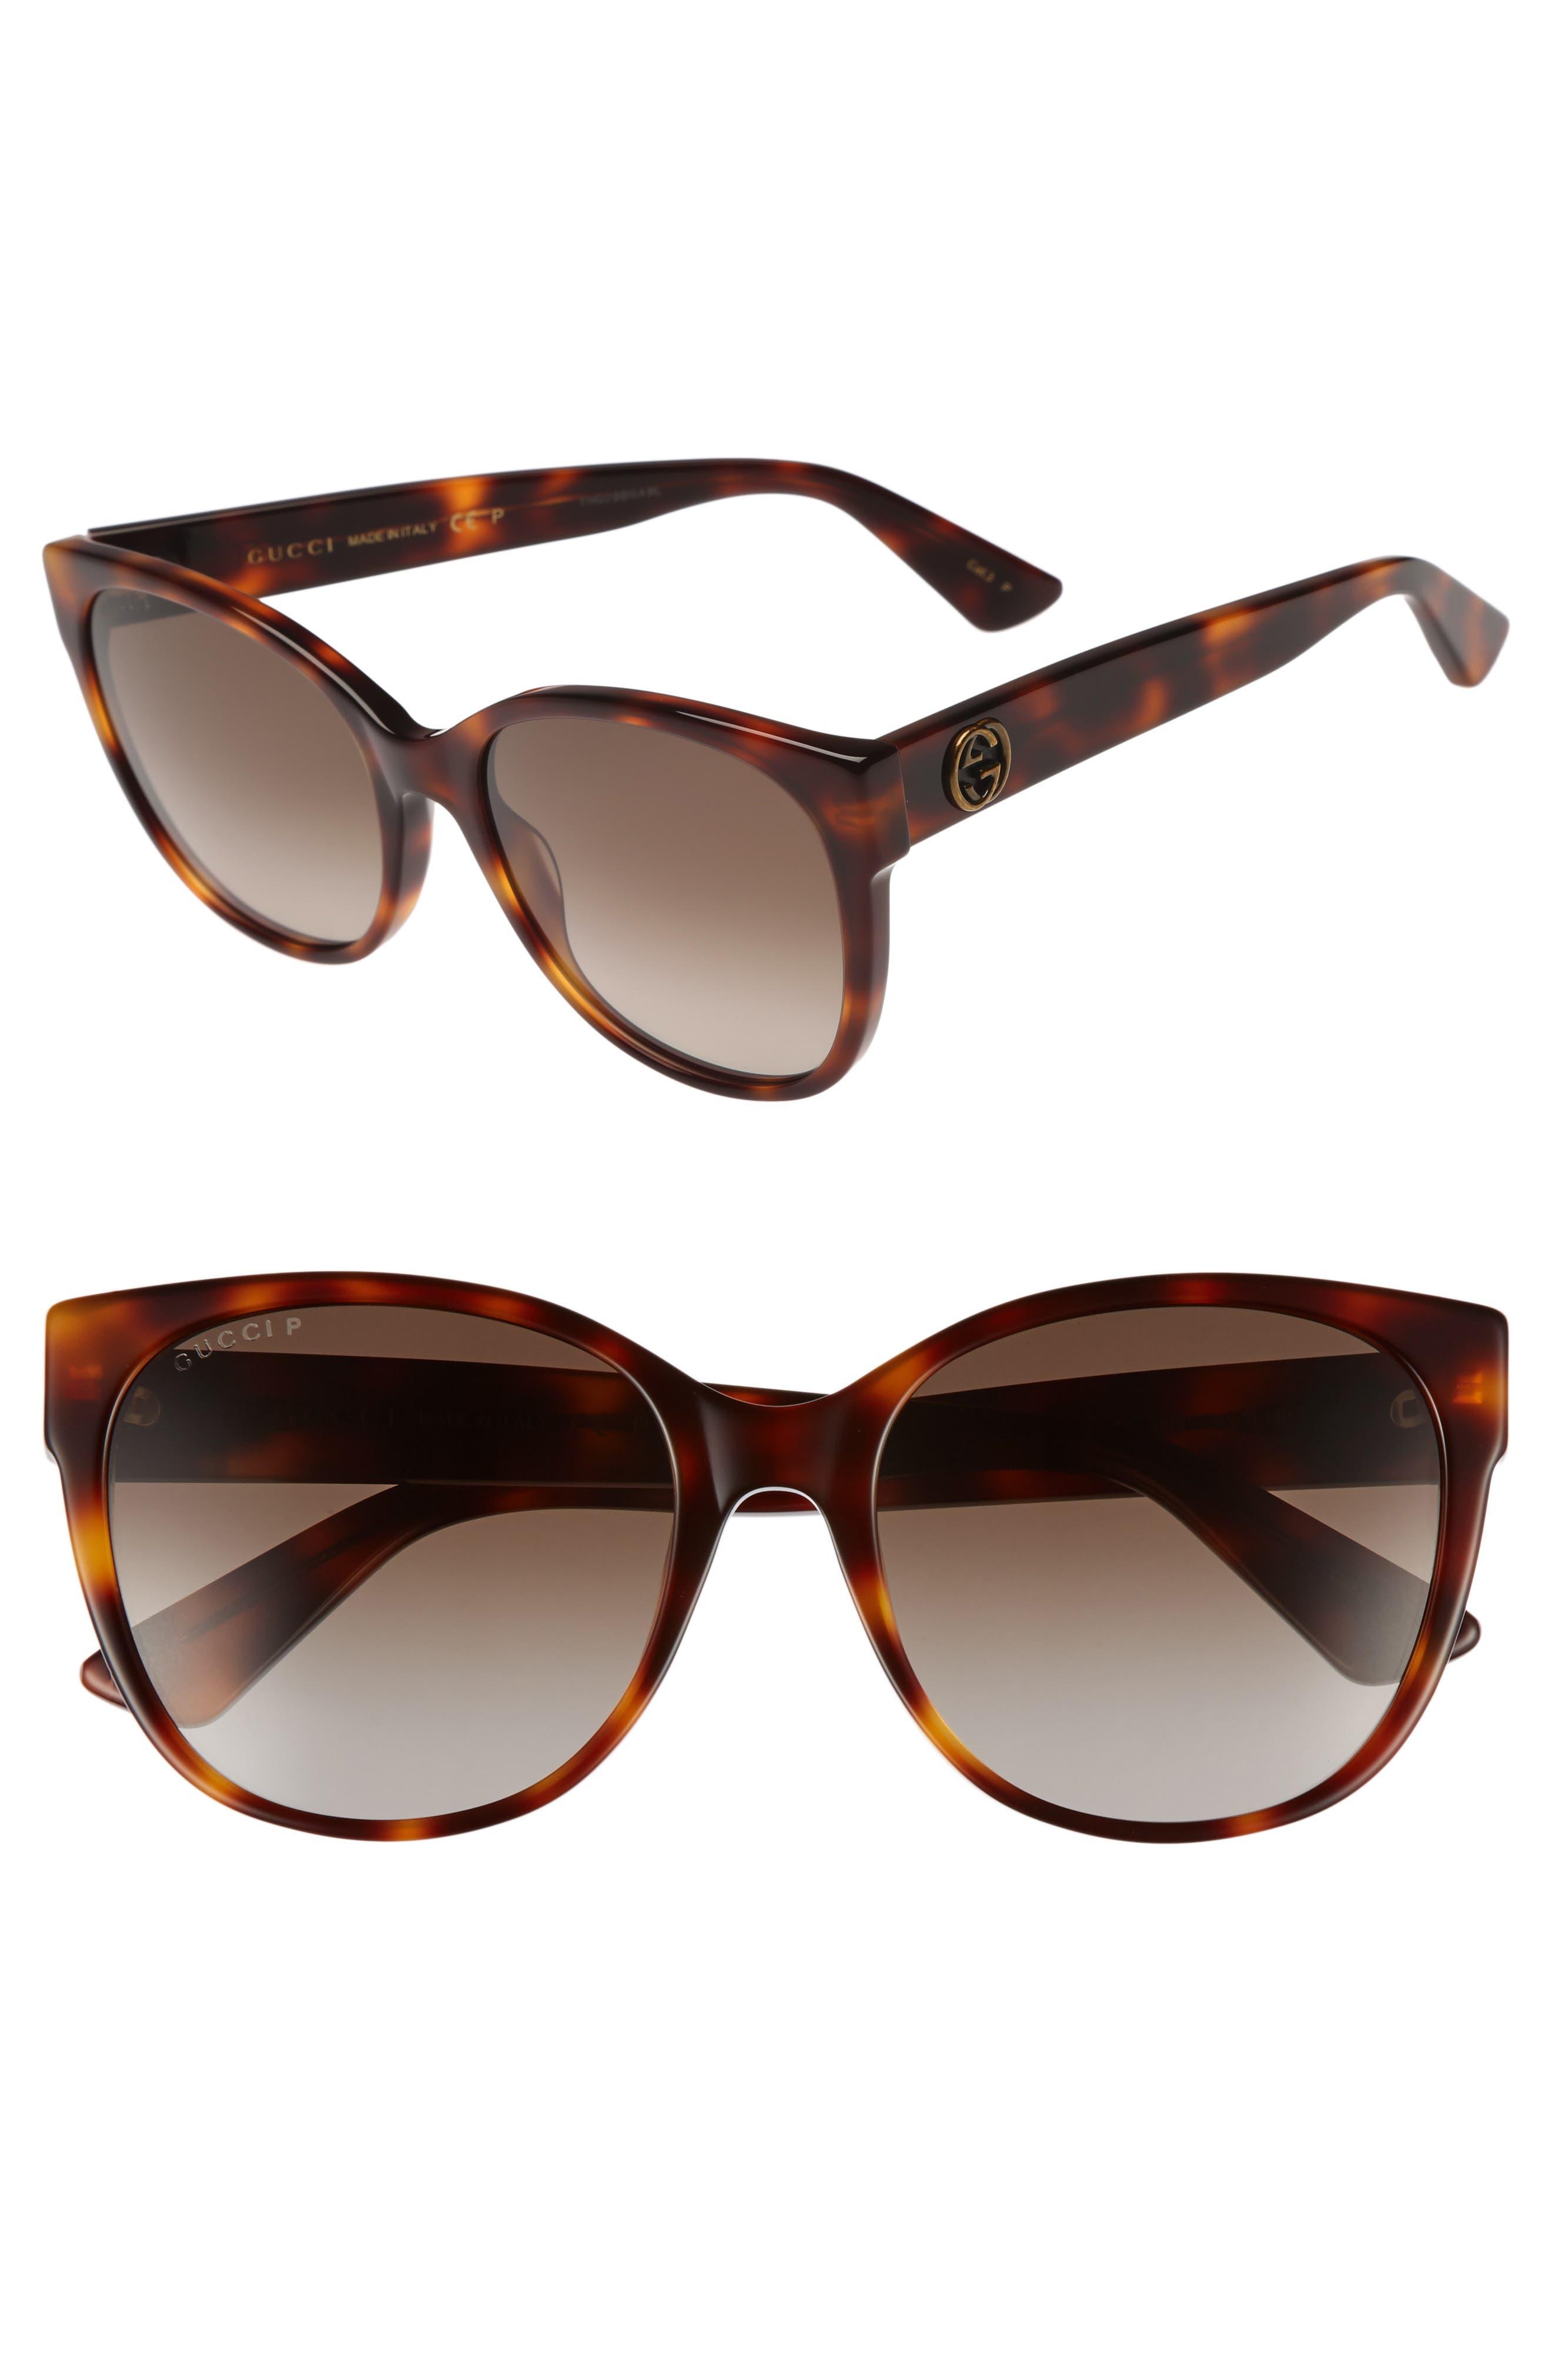 56mm Polarized Cat Eye Sunglasses,                             Main thumbnail 1, color,                             200